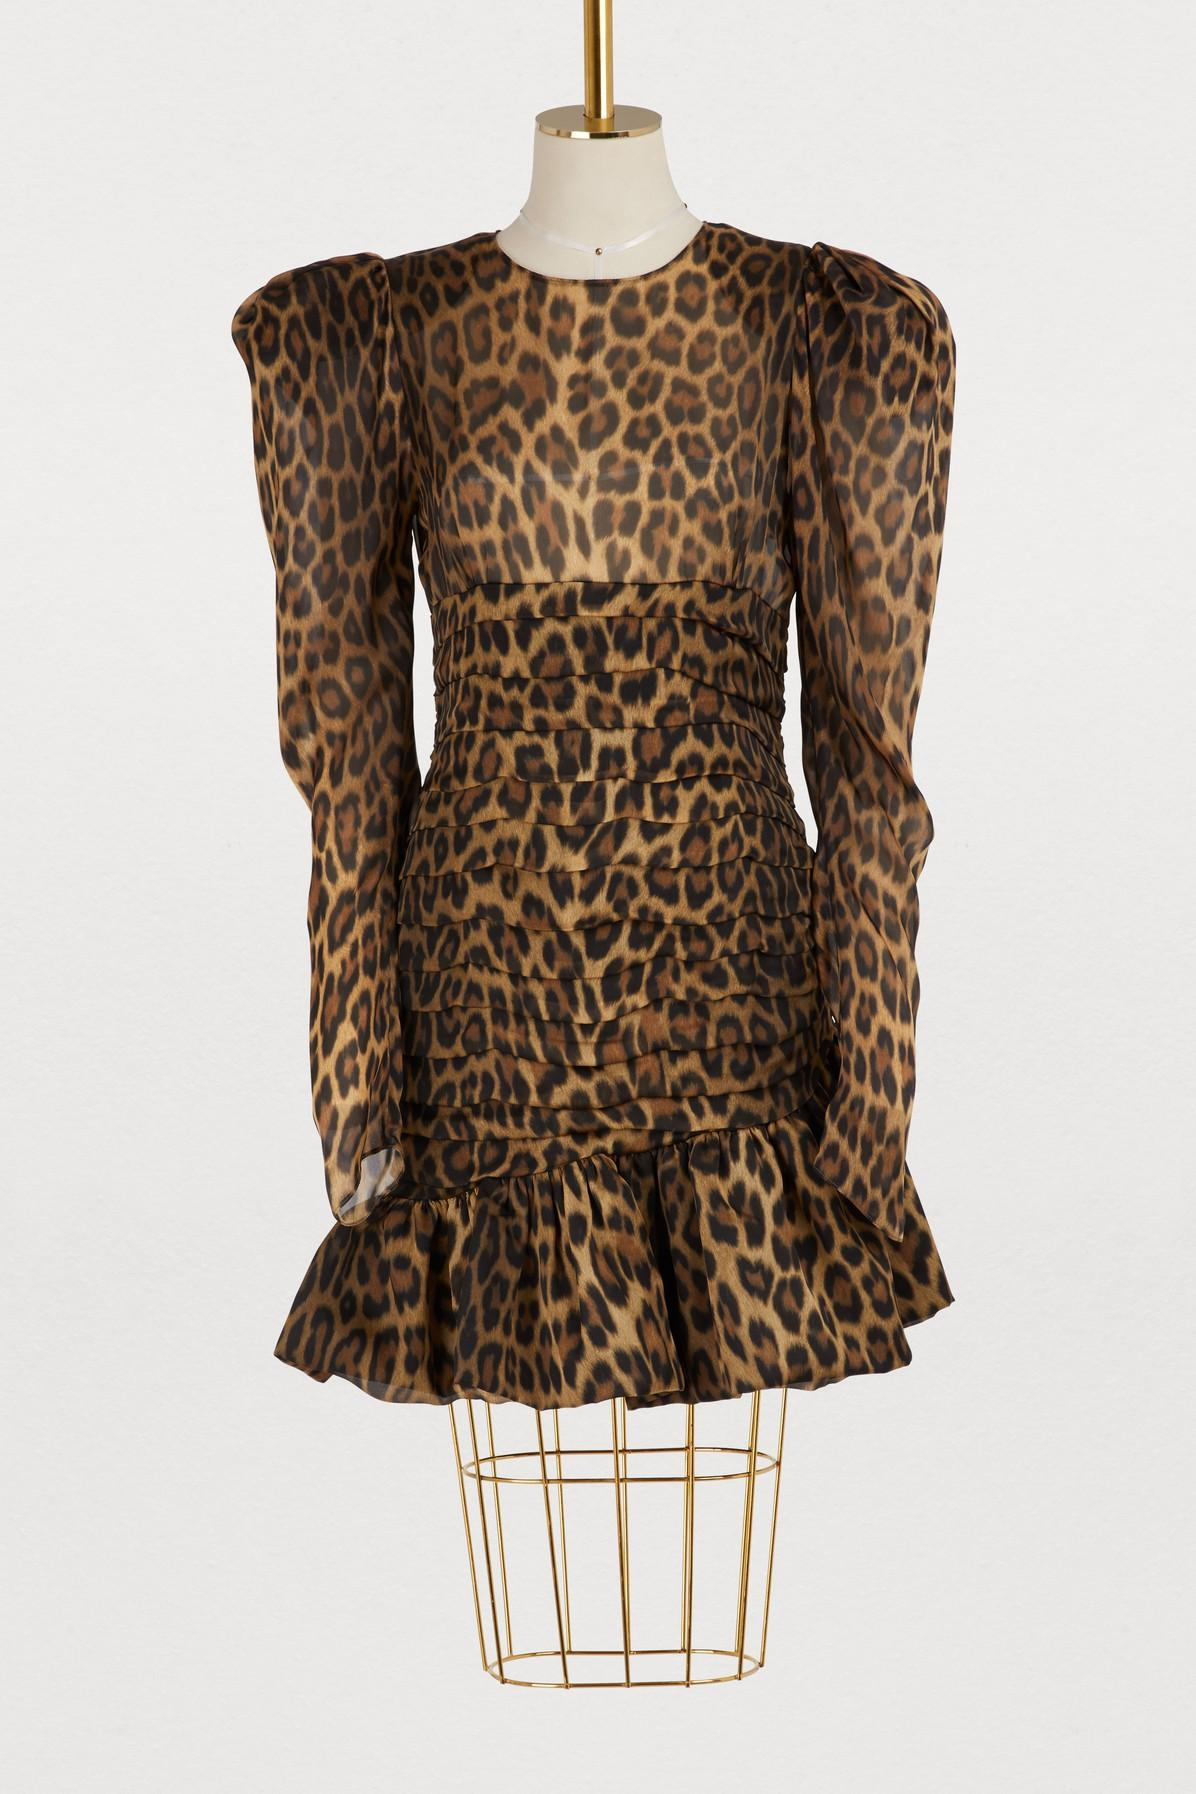 559c844caf11 Magda Butrym Borneo Short Dress In Brown | ModeSens